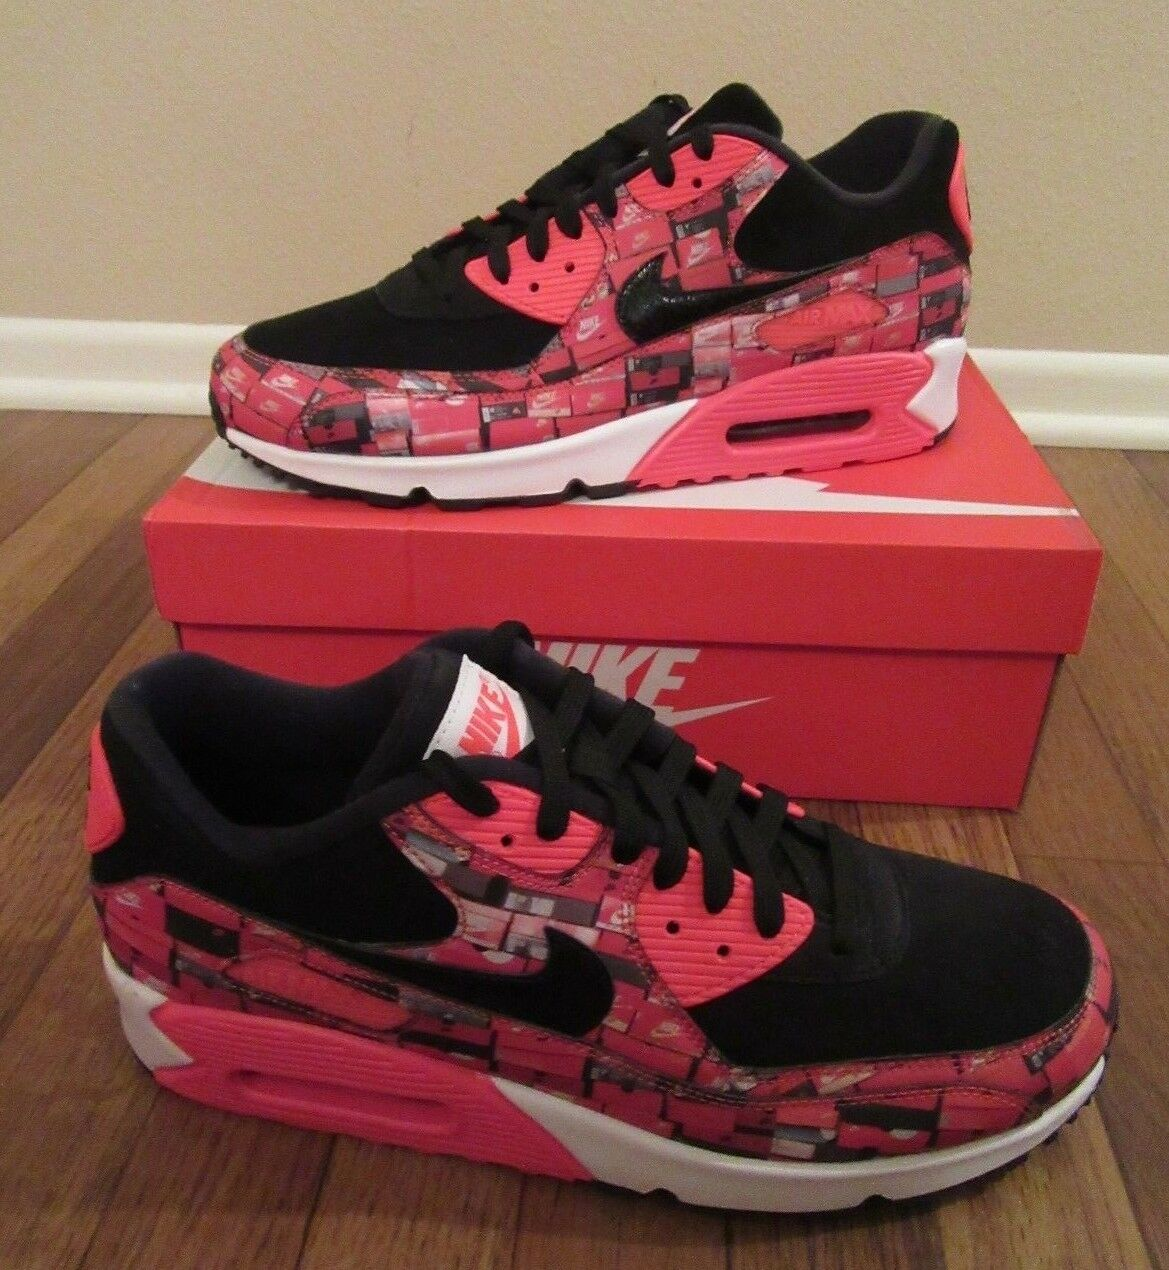 Nike Air Max 90 Print Size 11.5 Black Bright Crimson AQ0926 001 We Love Nike NIB